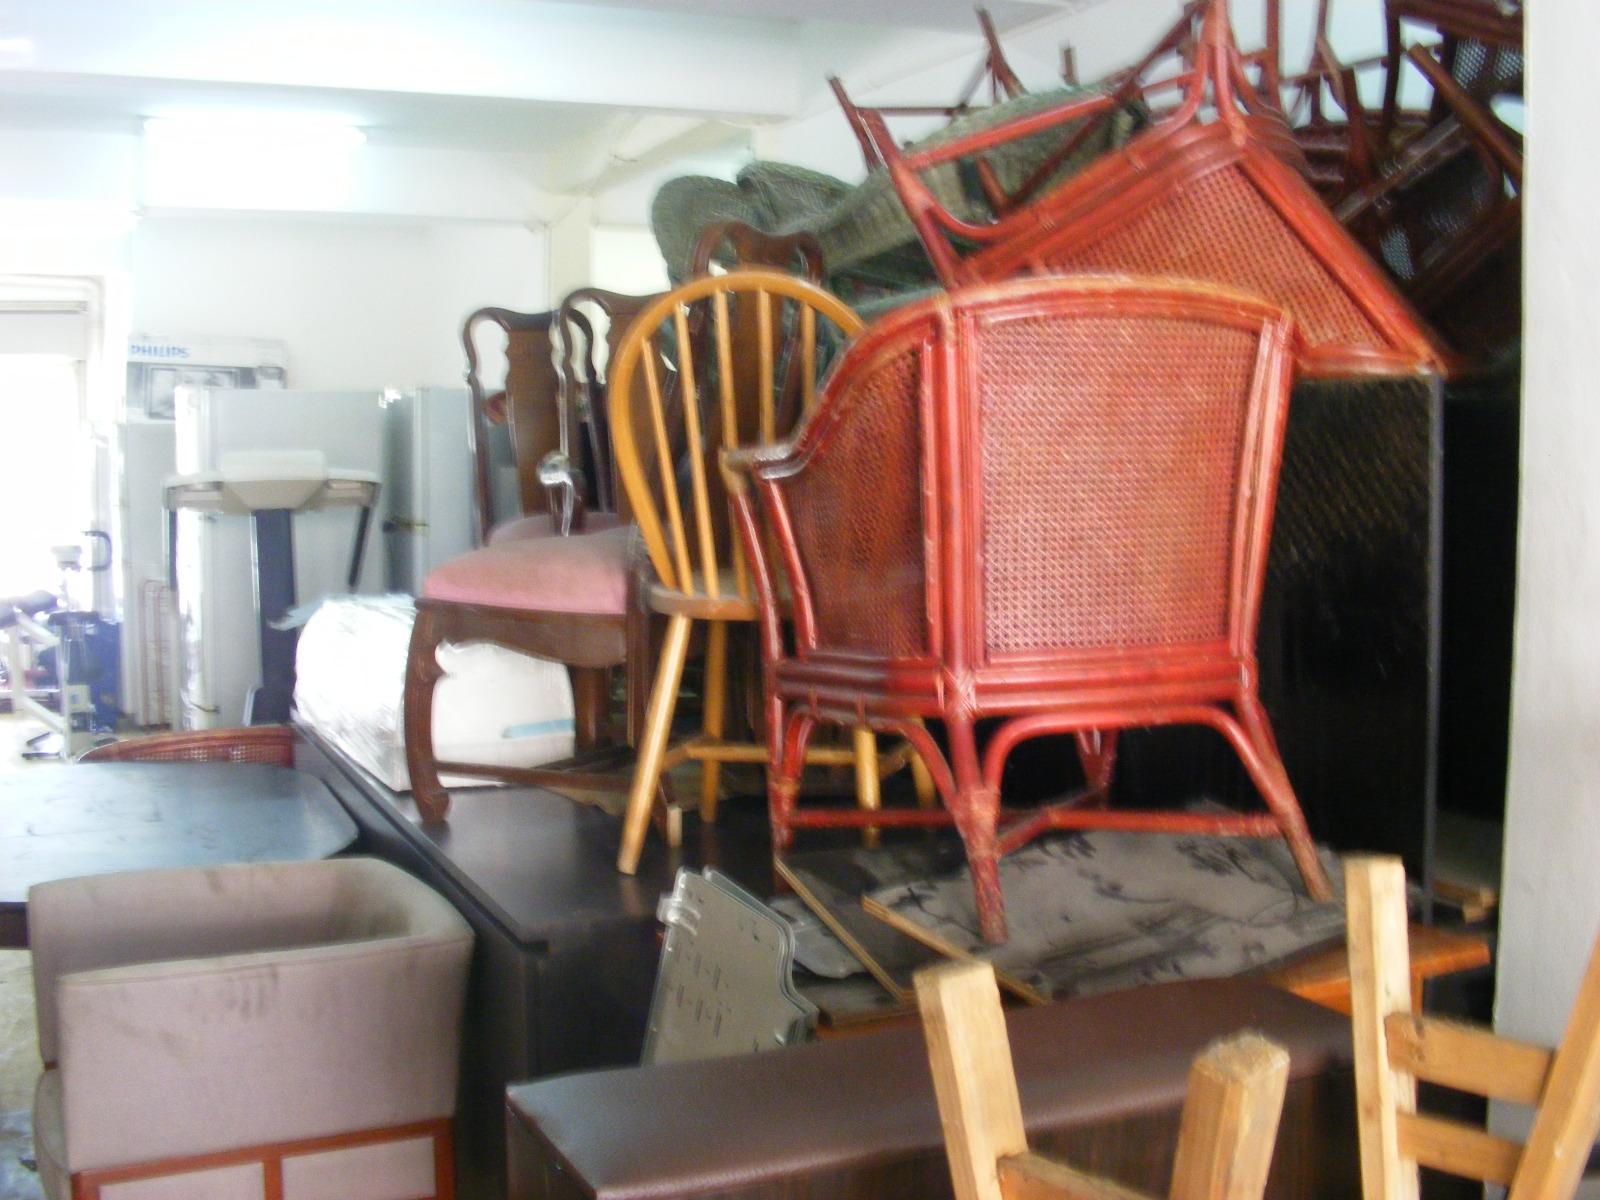 Mudah my johor for sale autos post Home furniture kota kinabalu